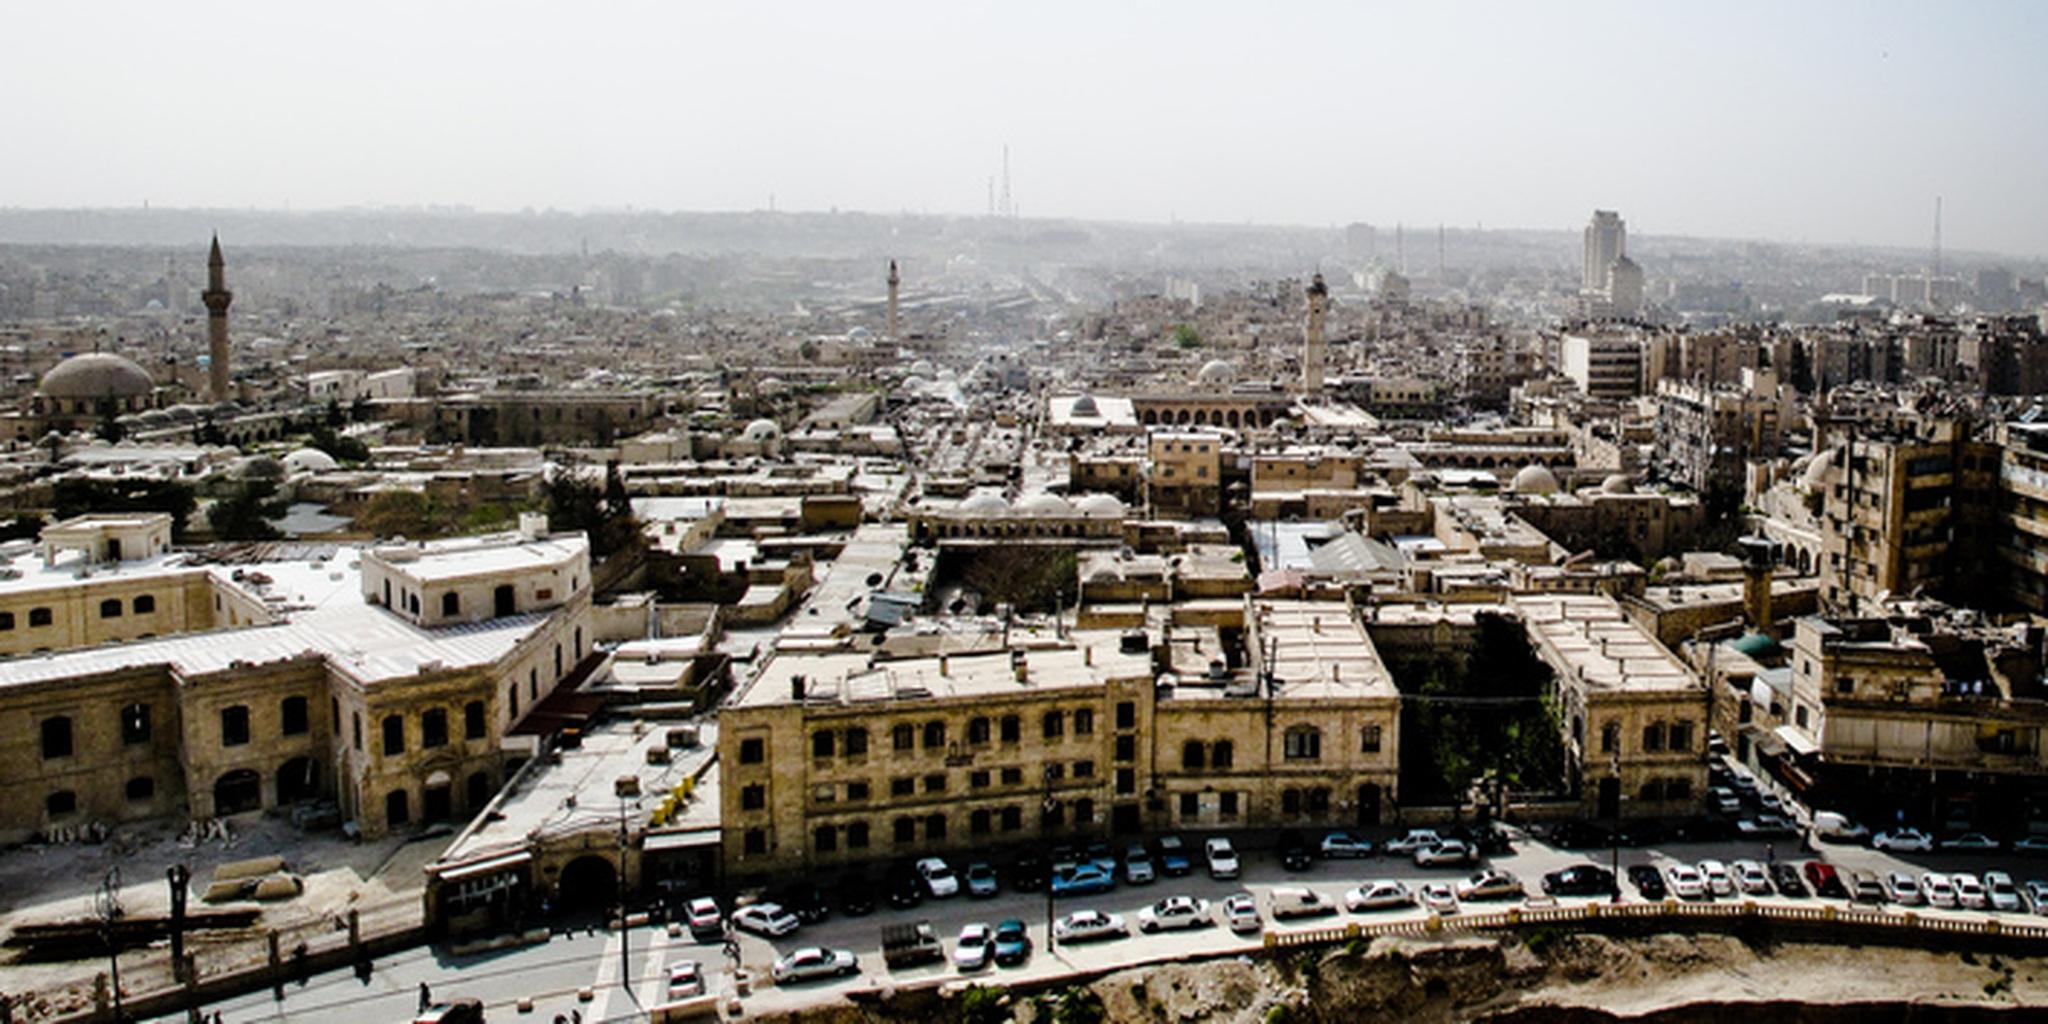 syria | Flickr - Photo Sharing!